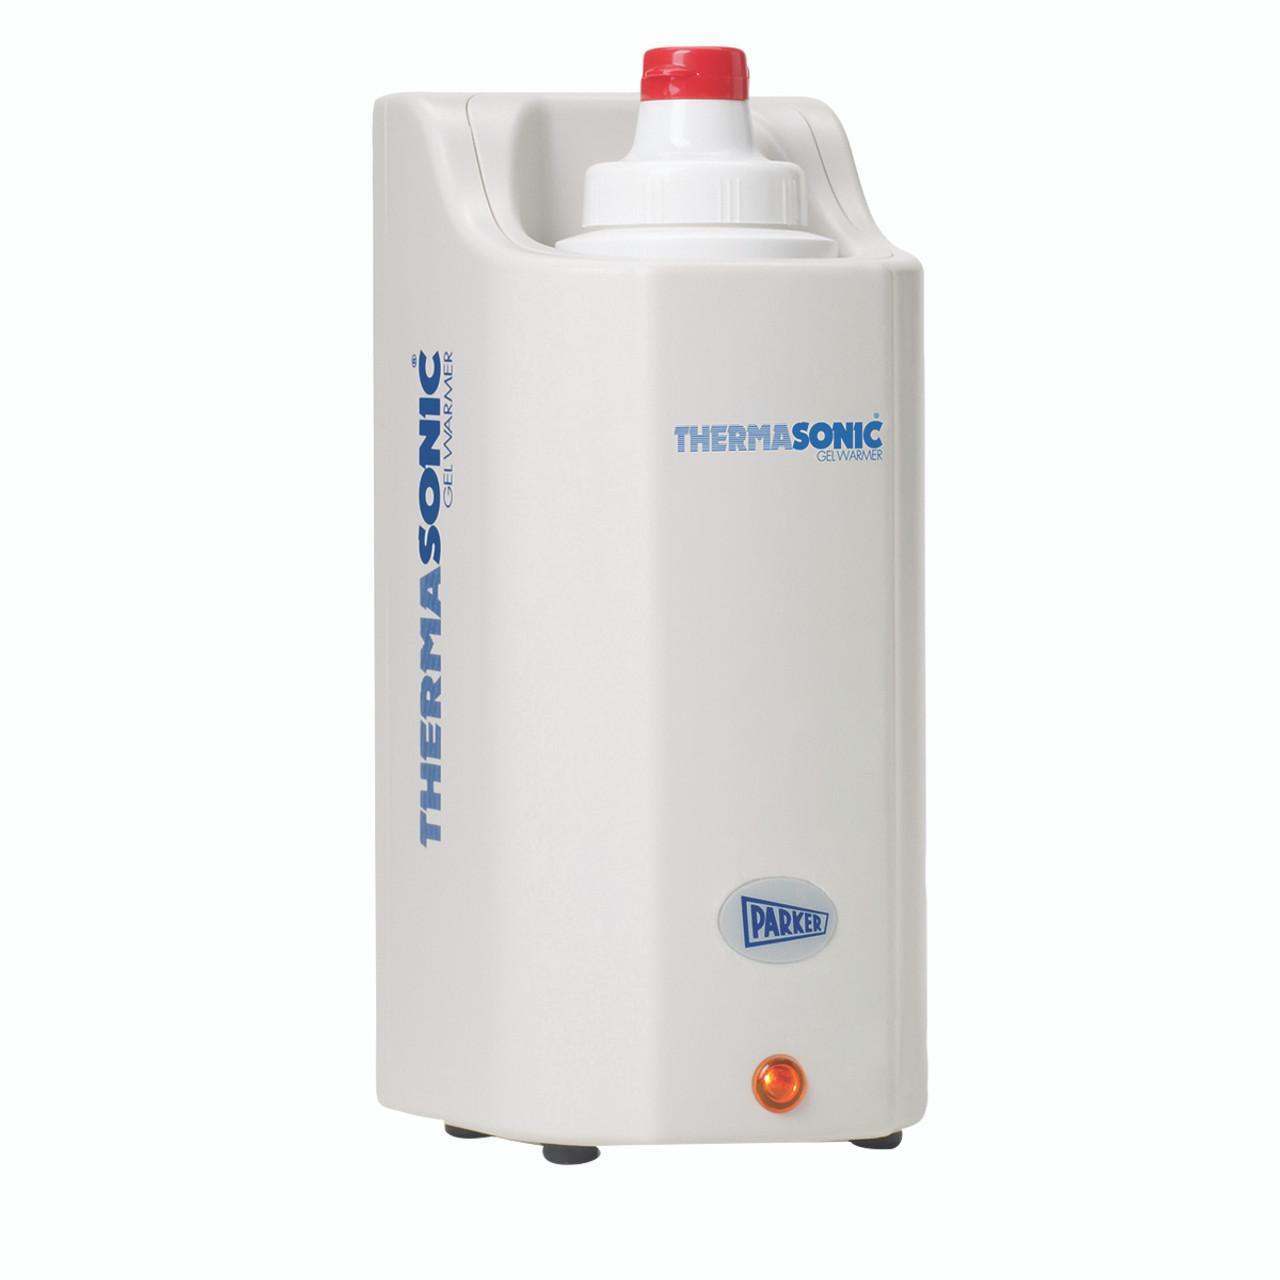 Thermasonic¨ - single bottle warmer - 230V